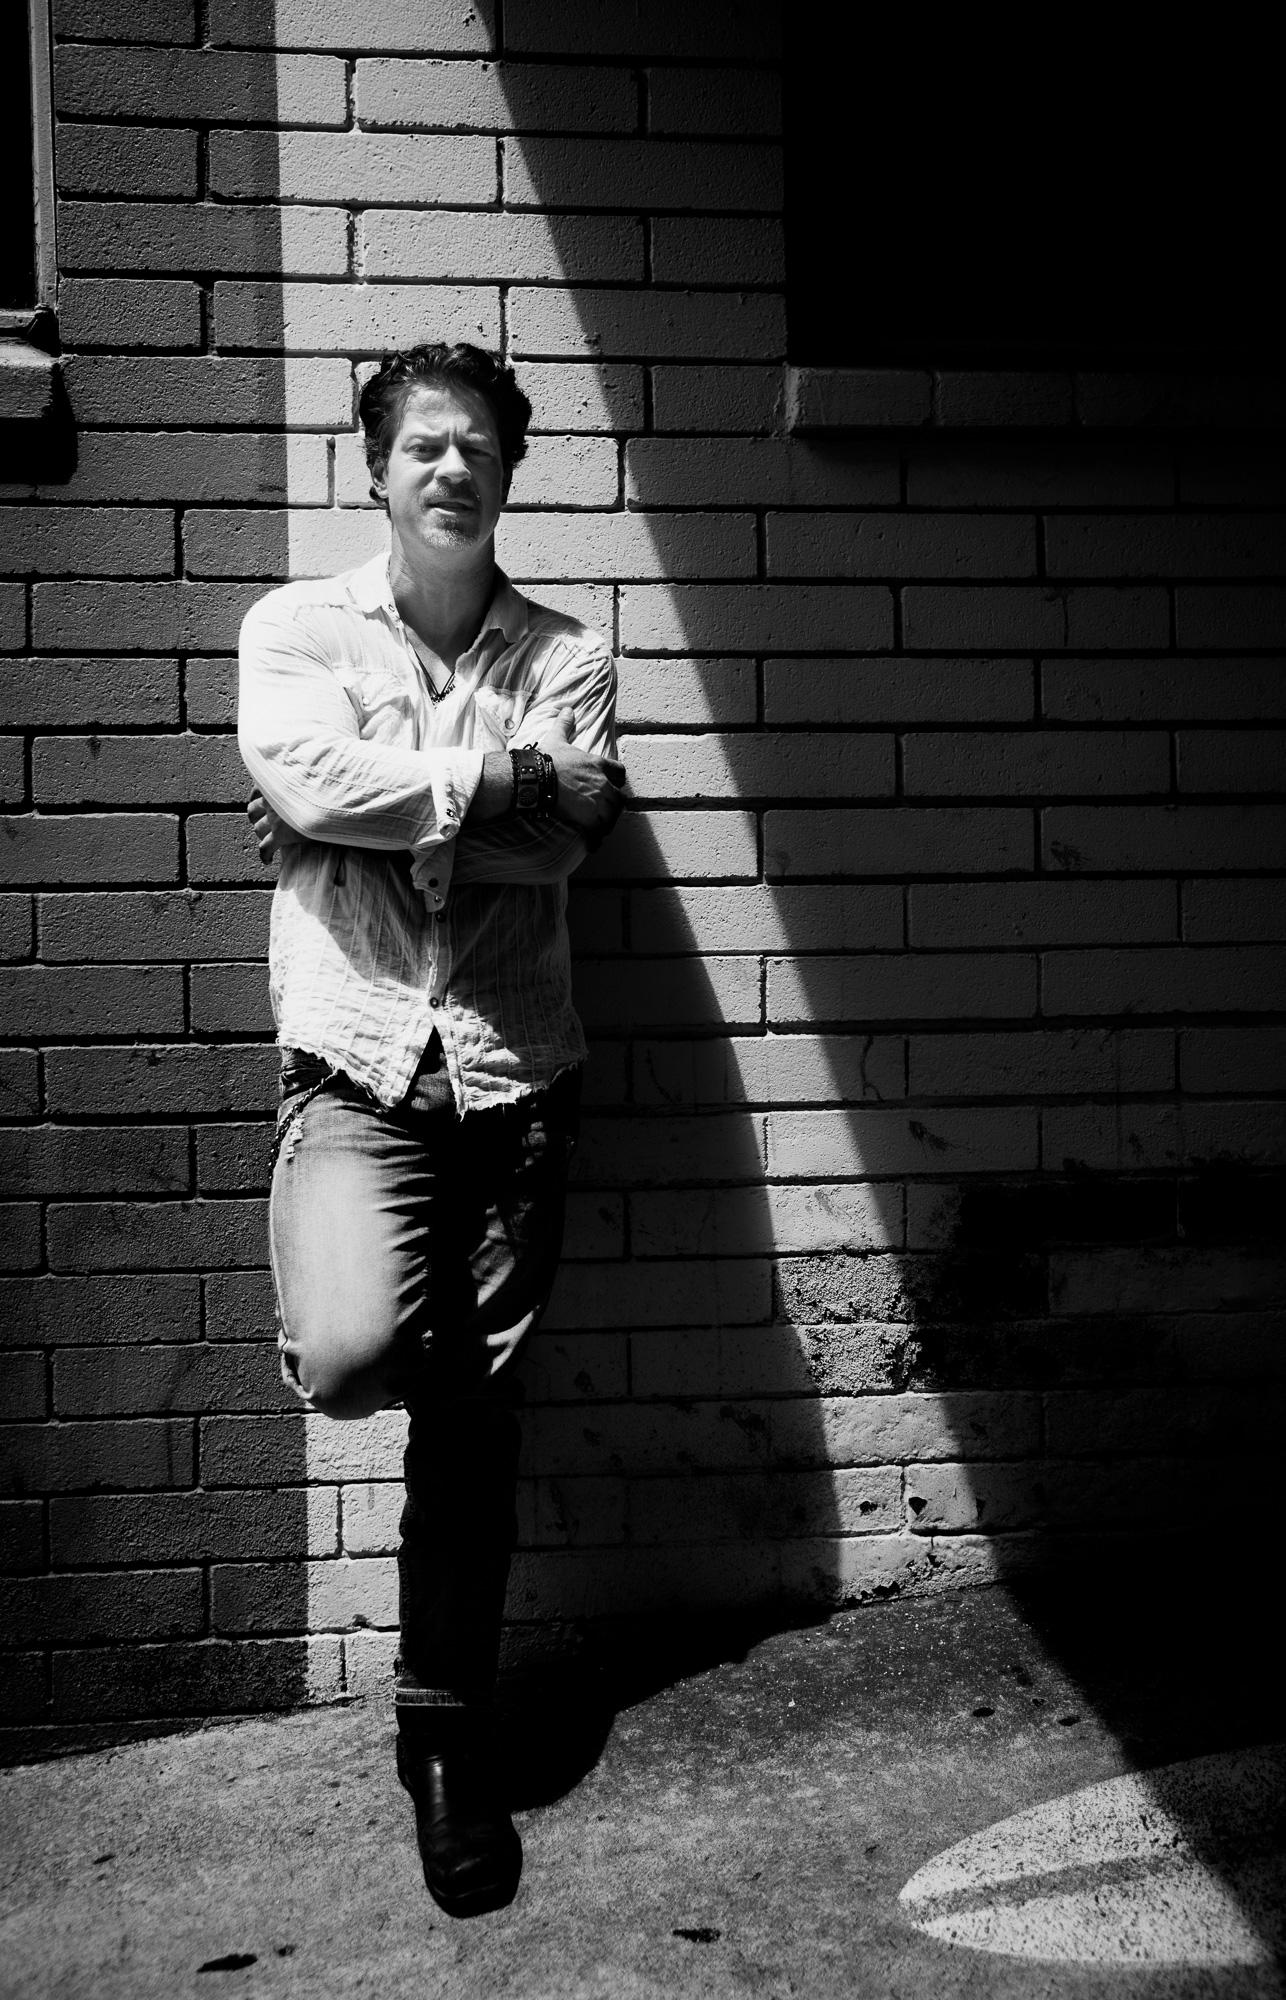 Joshua wilder oakley, lifestyle photography, lifestyle photographer, portrait photography, portrait photography